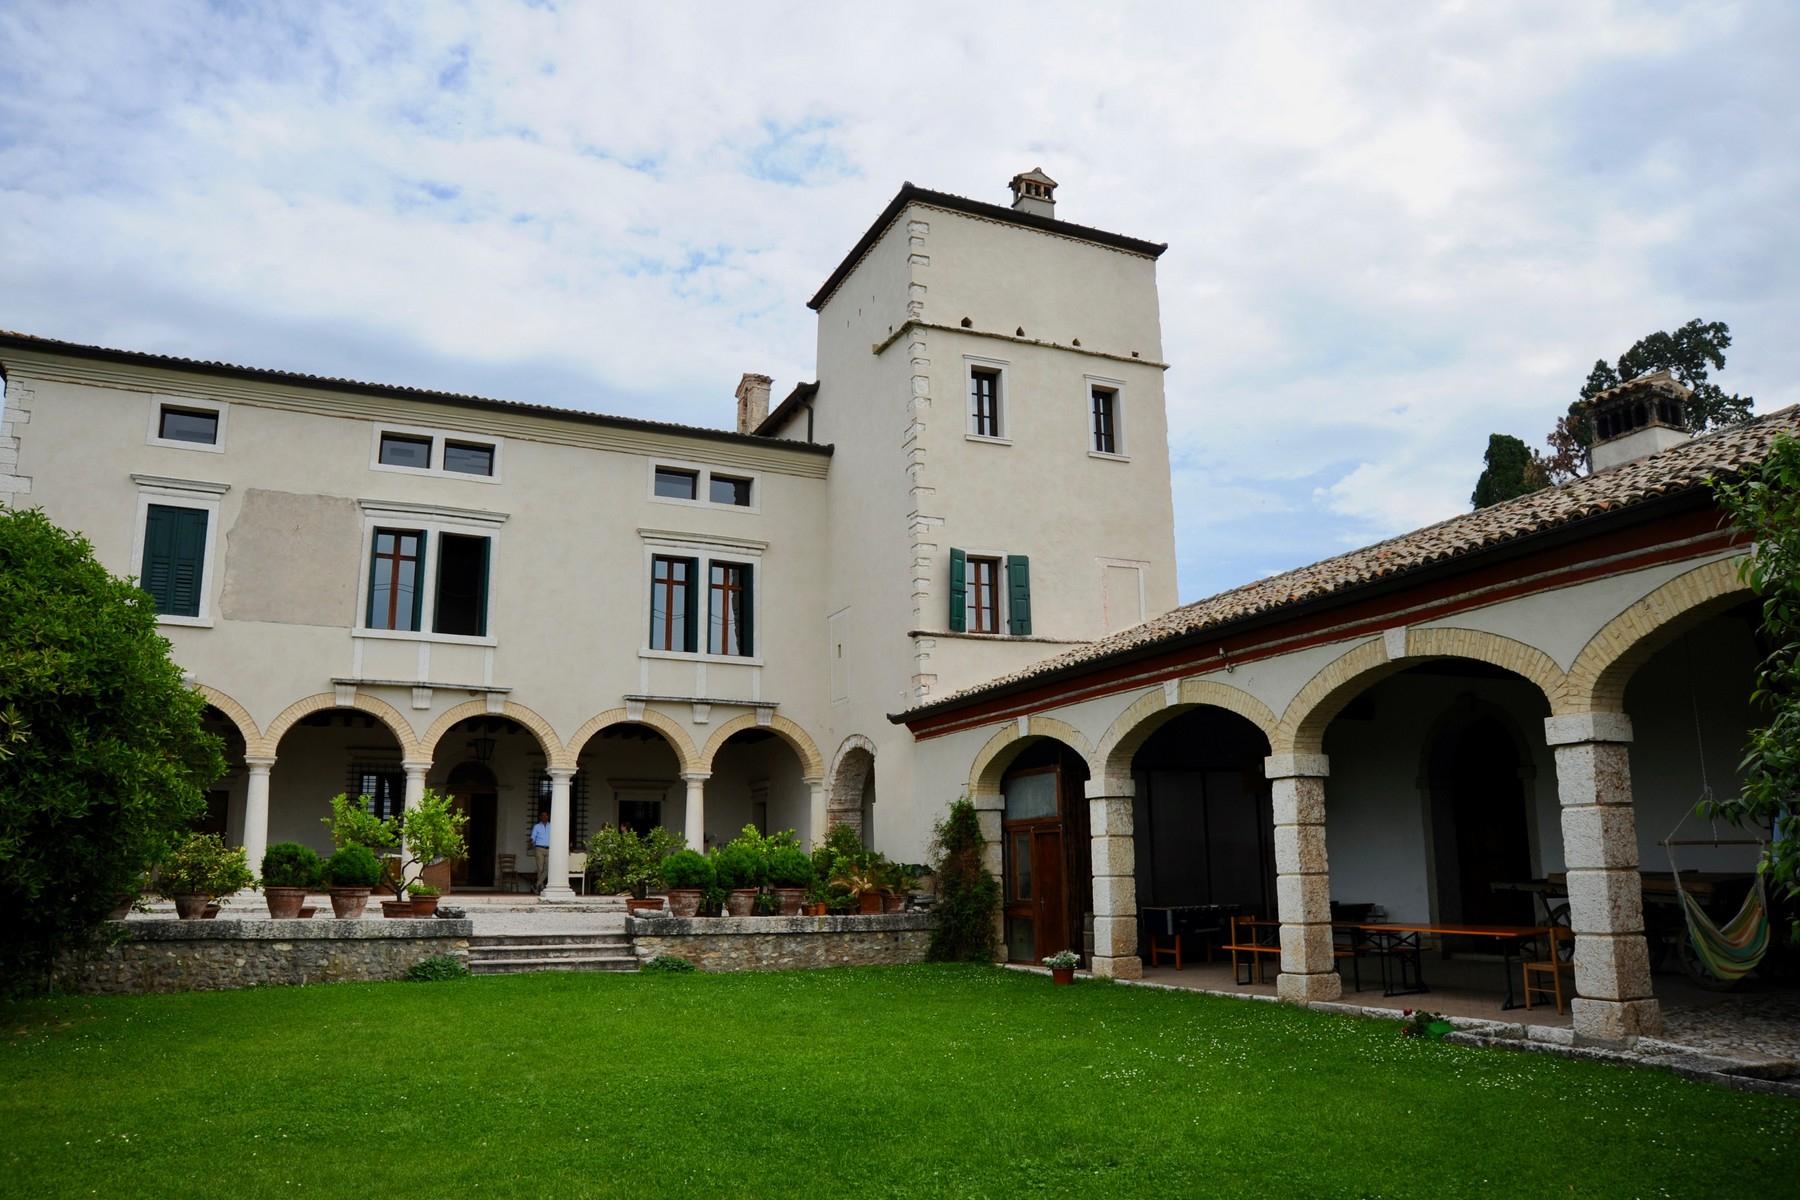 Villa in Vendita a Verona:  5 locali, 450 mq  - Foto 1